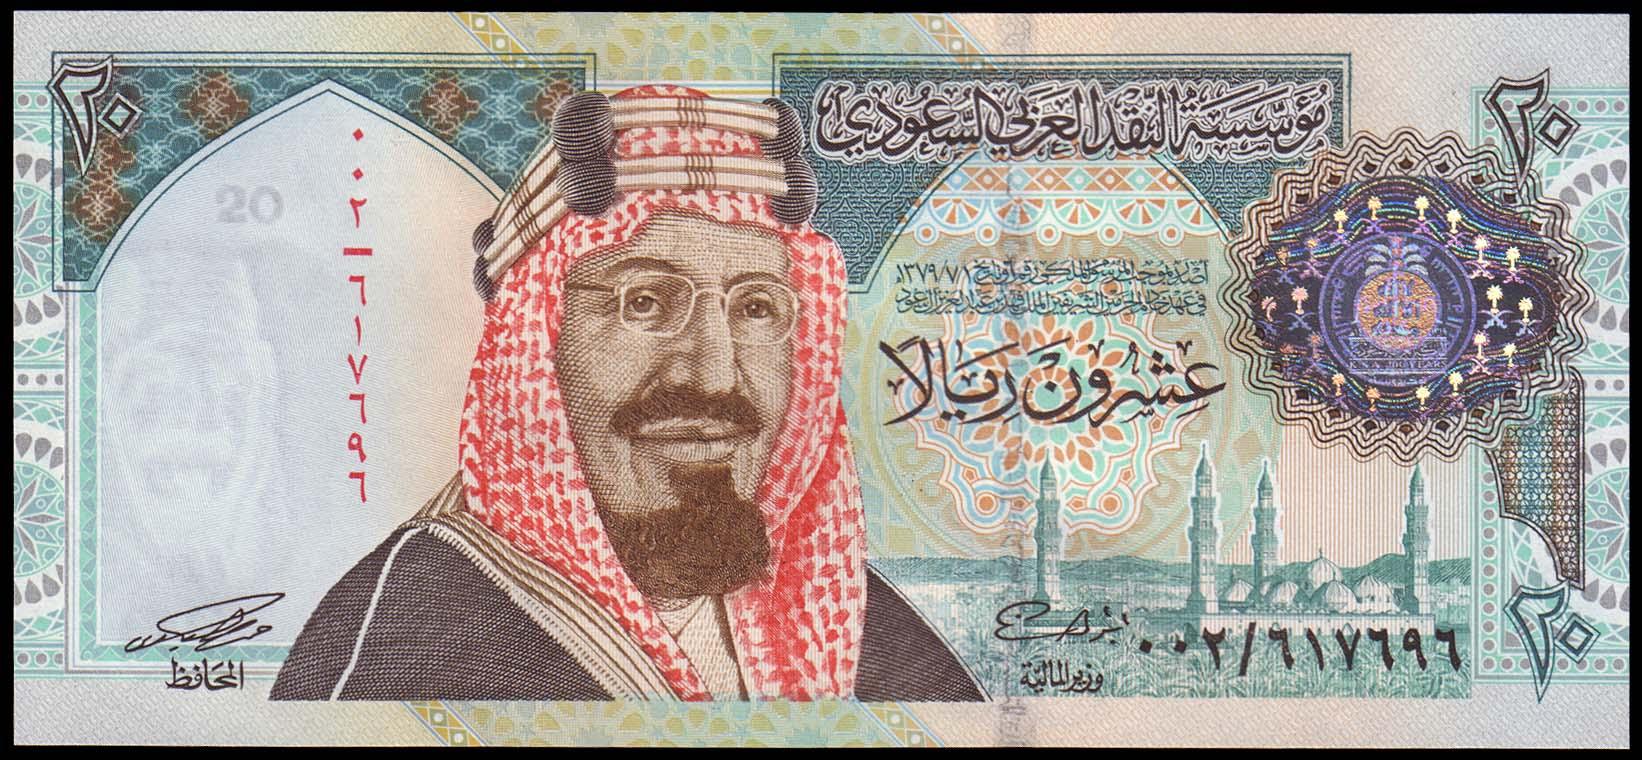 Fatwa forex di arab saudi